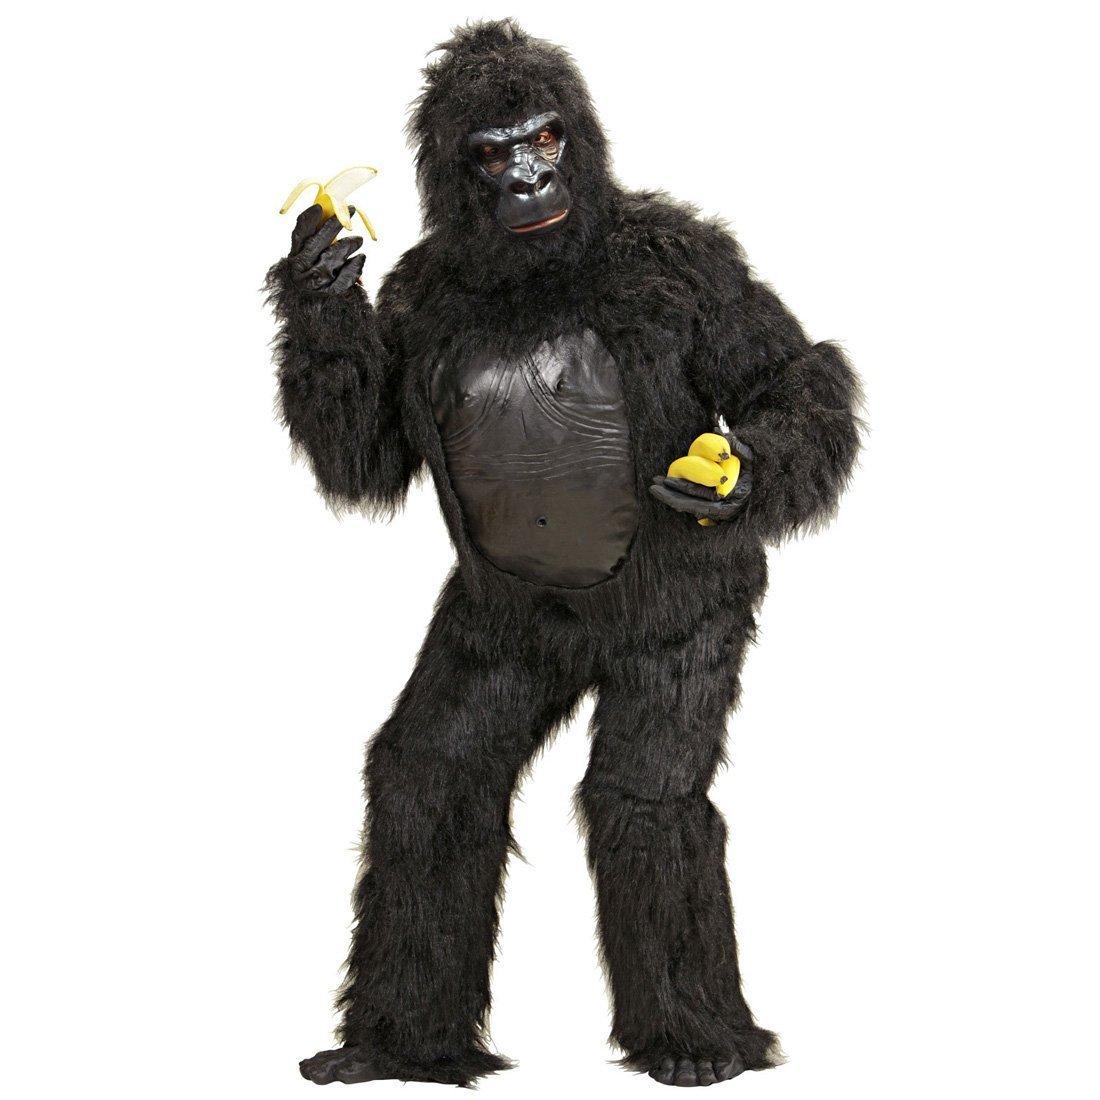 Gorille amazon 118